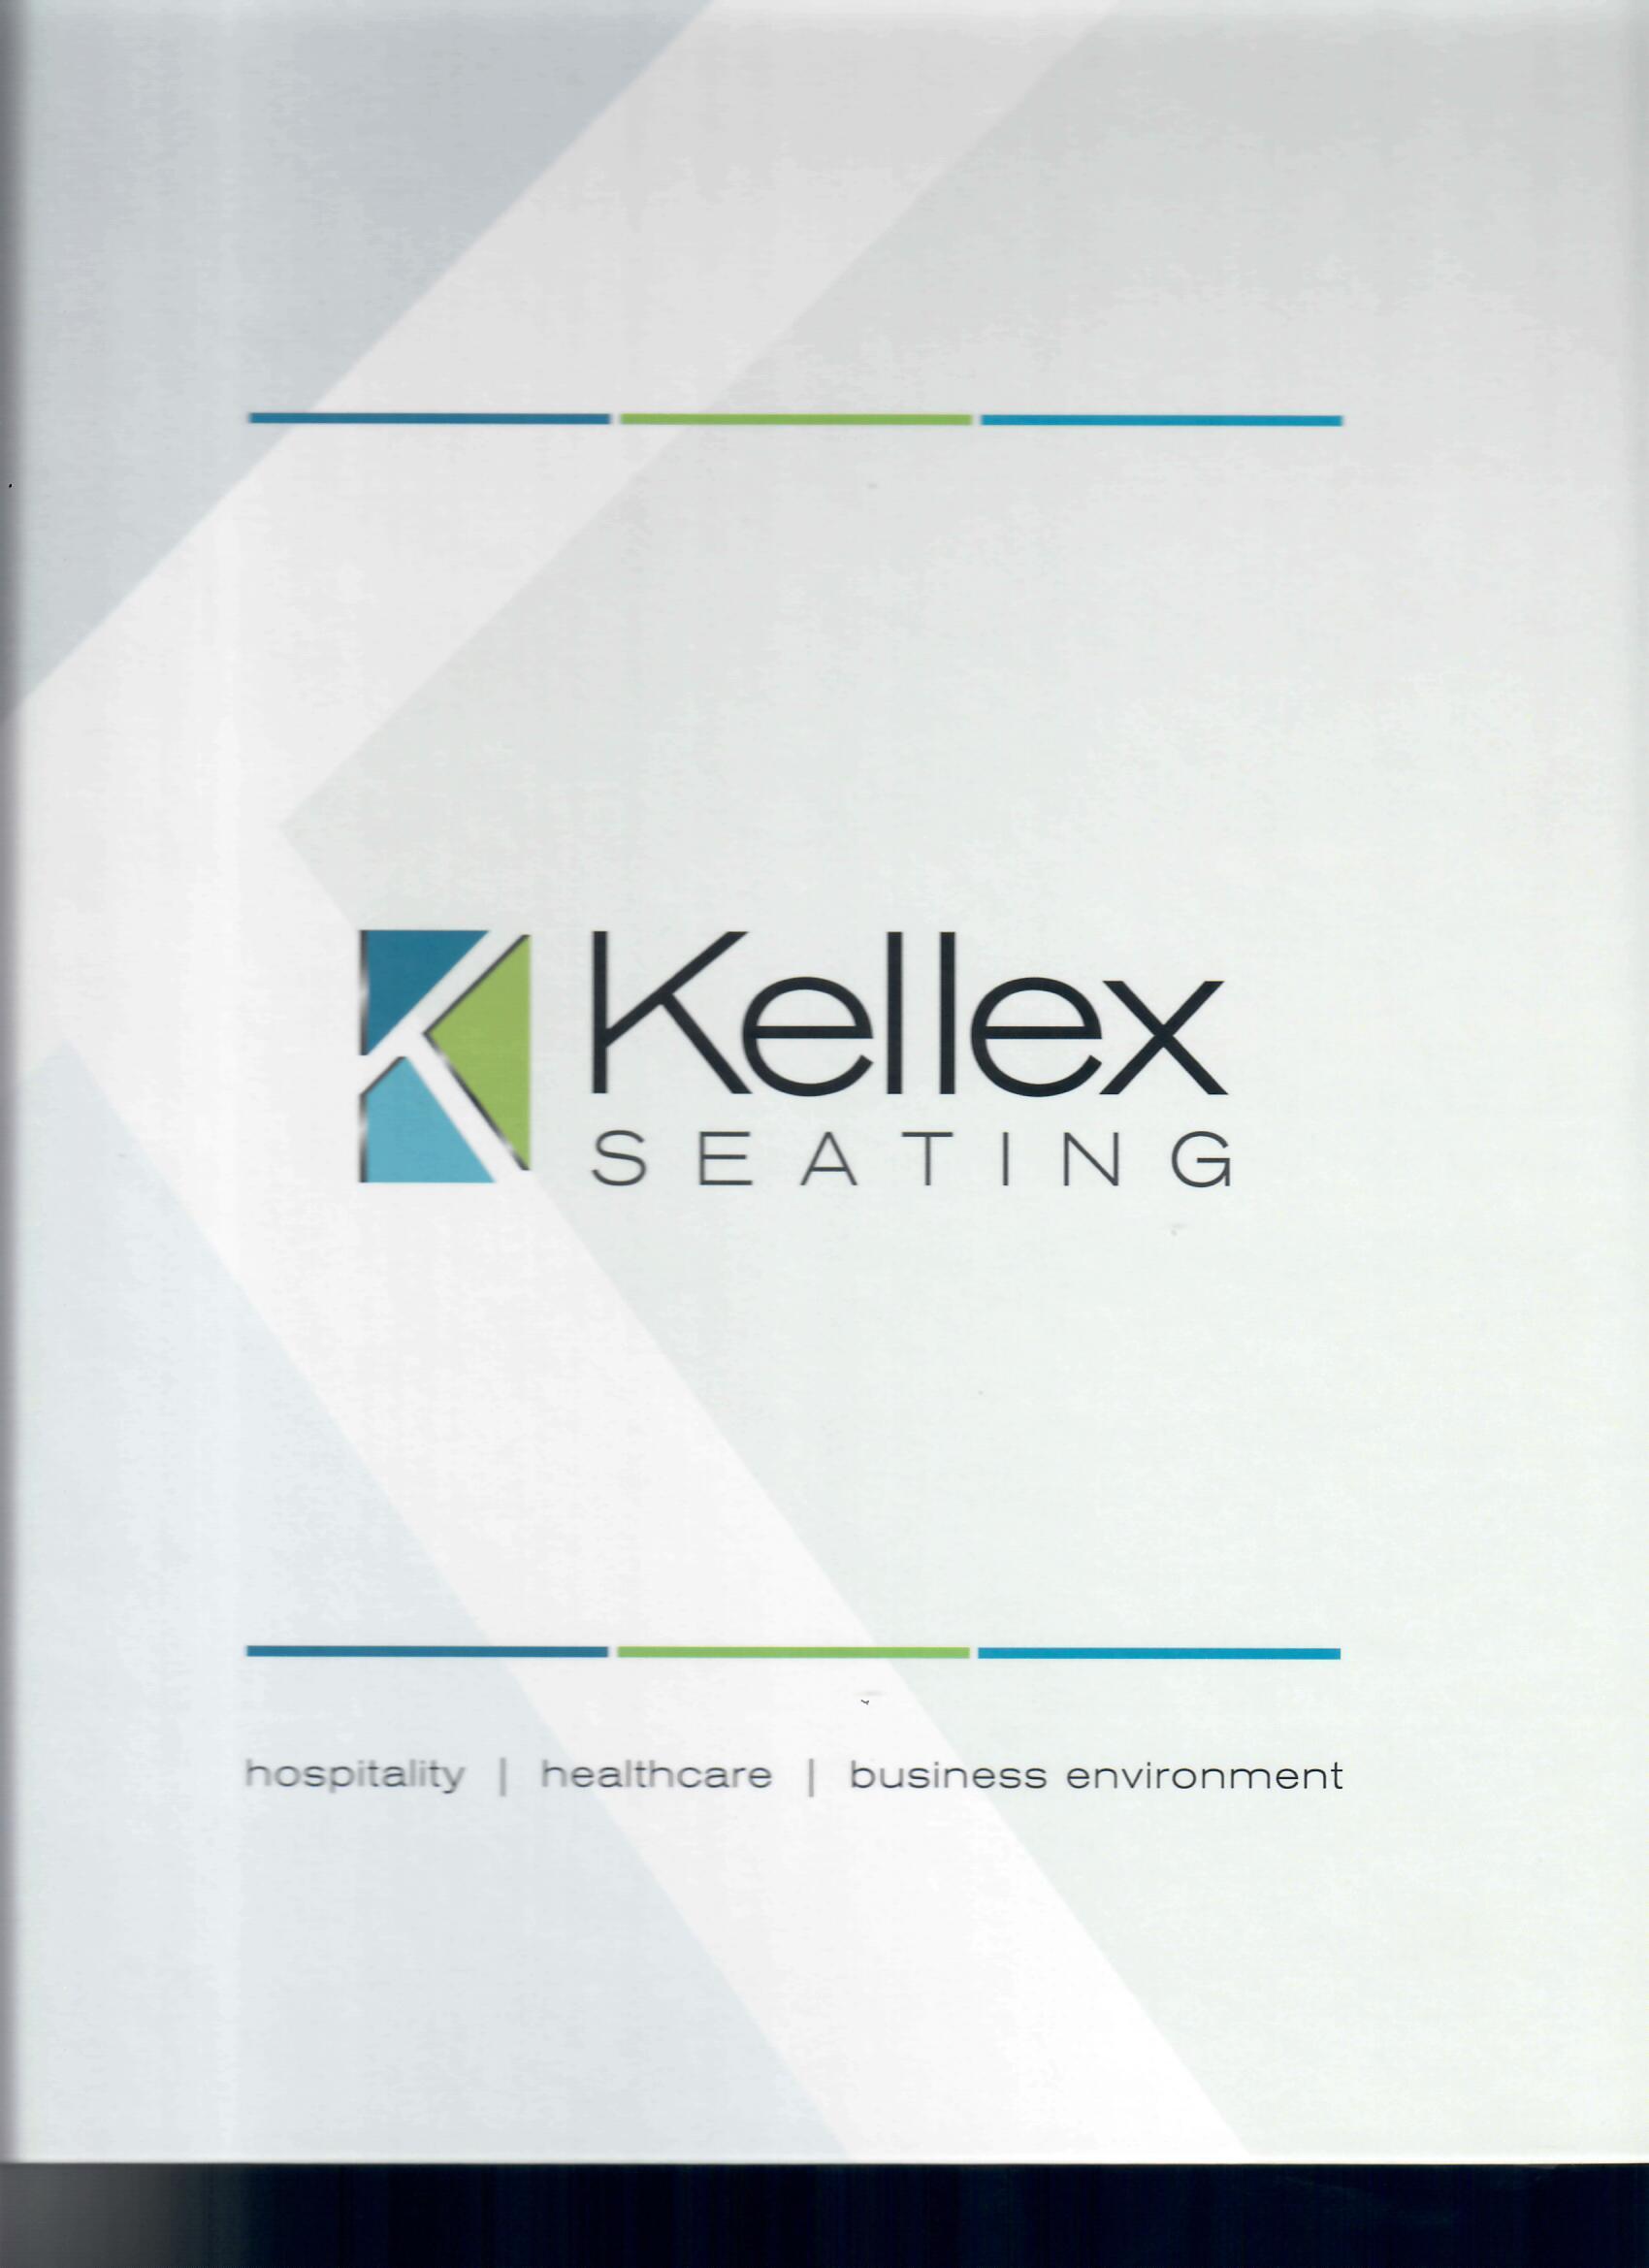 Kellex Seating